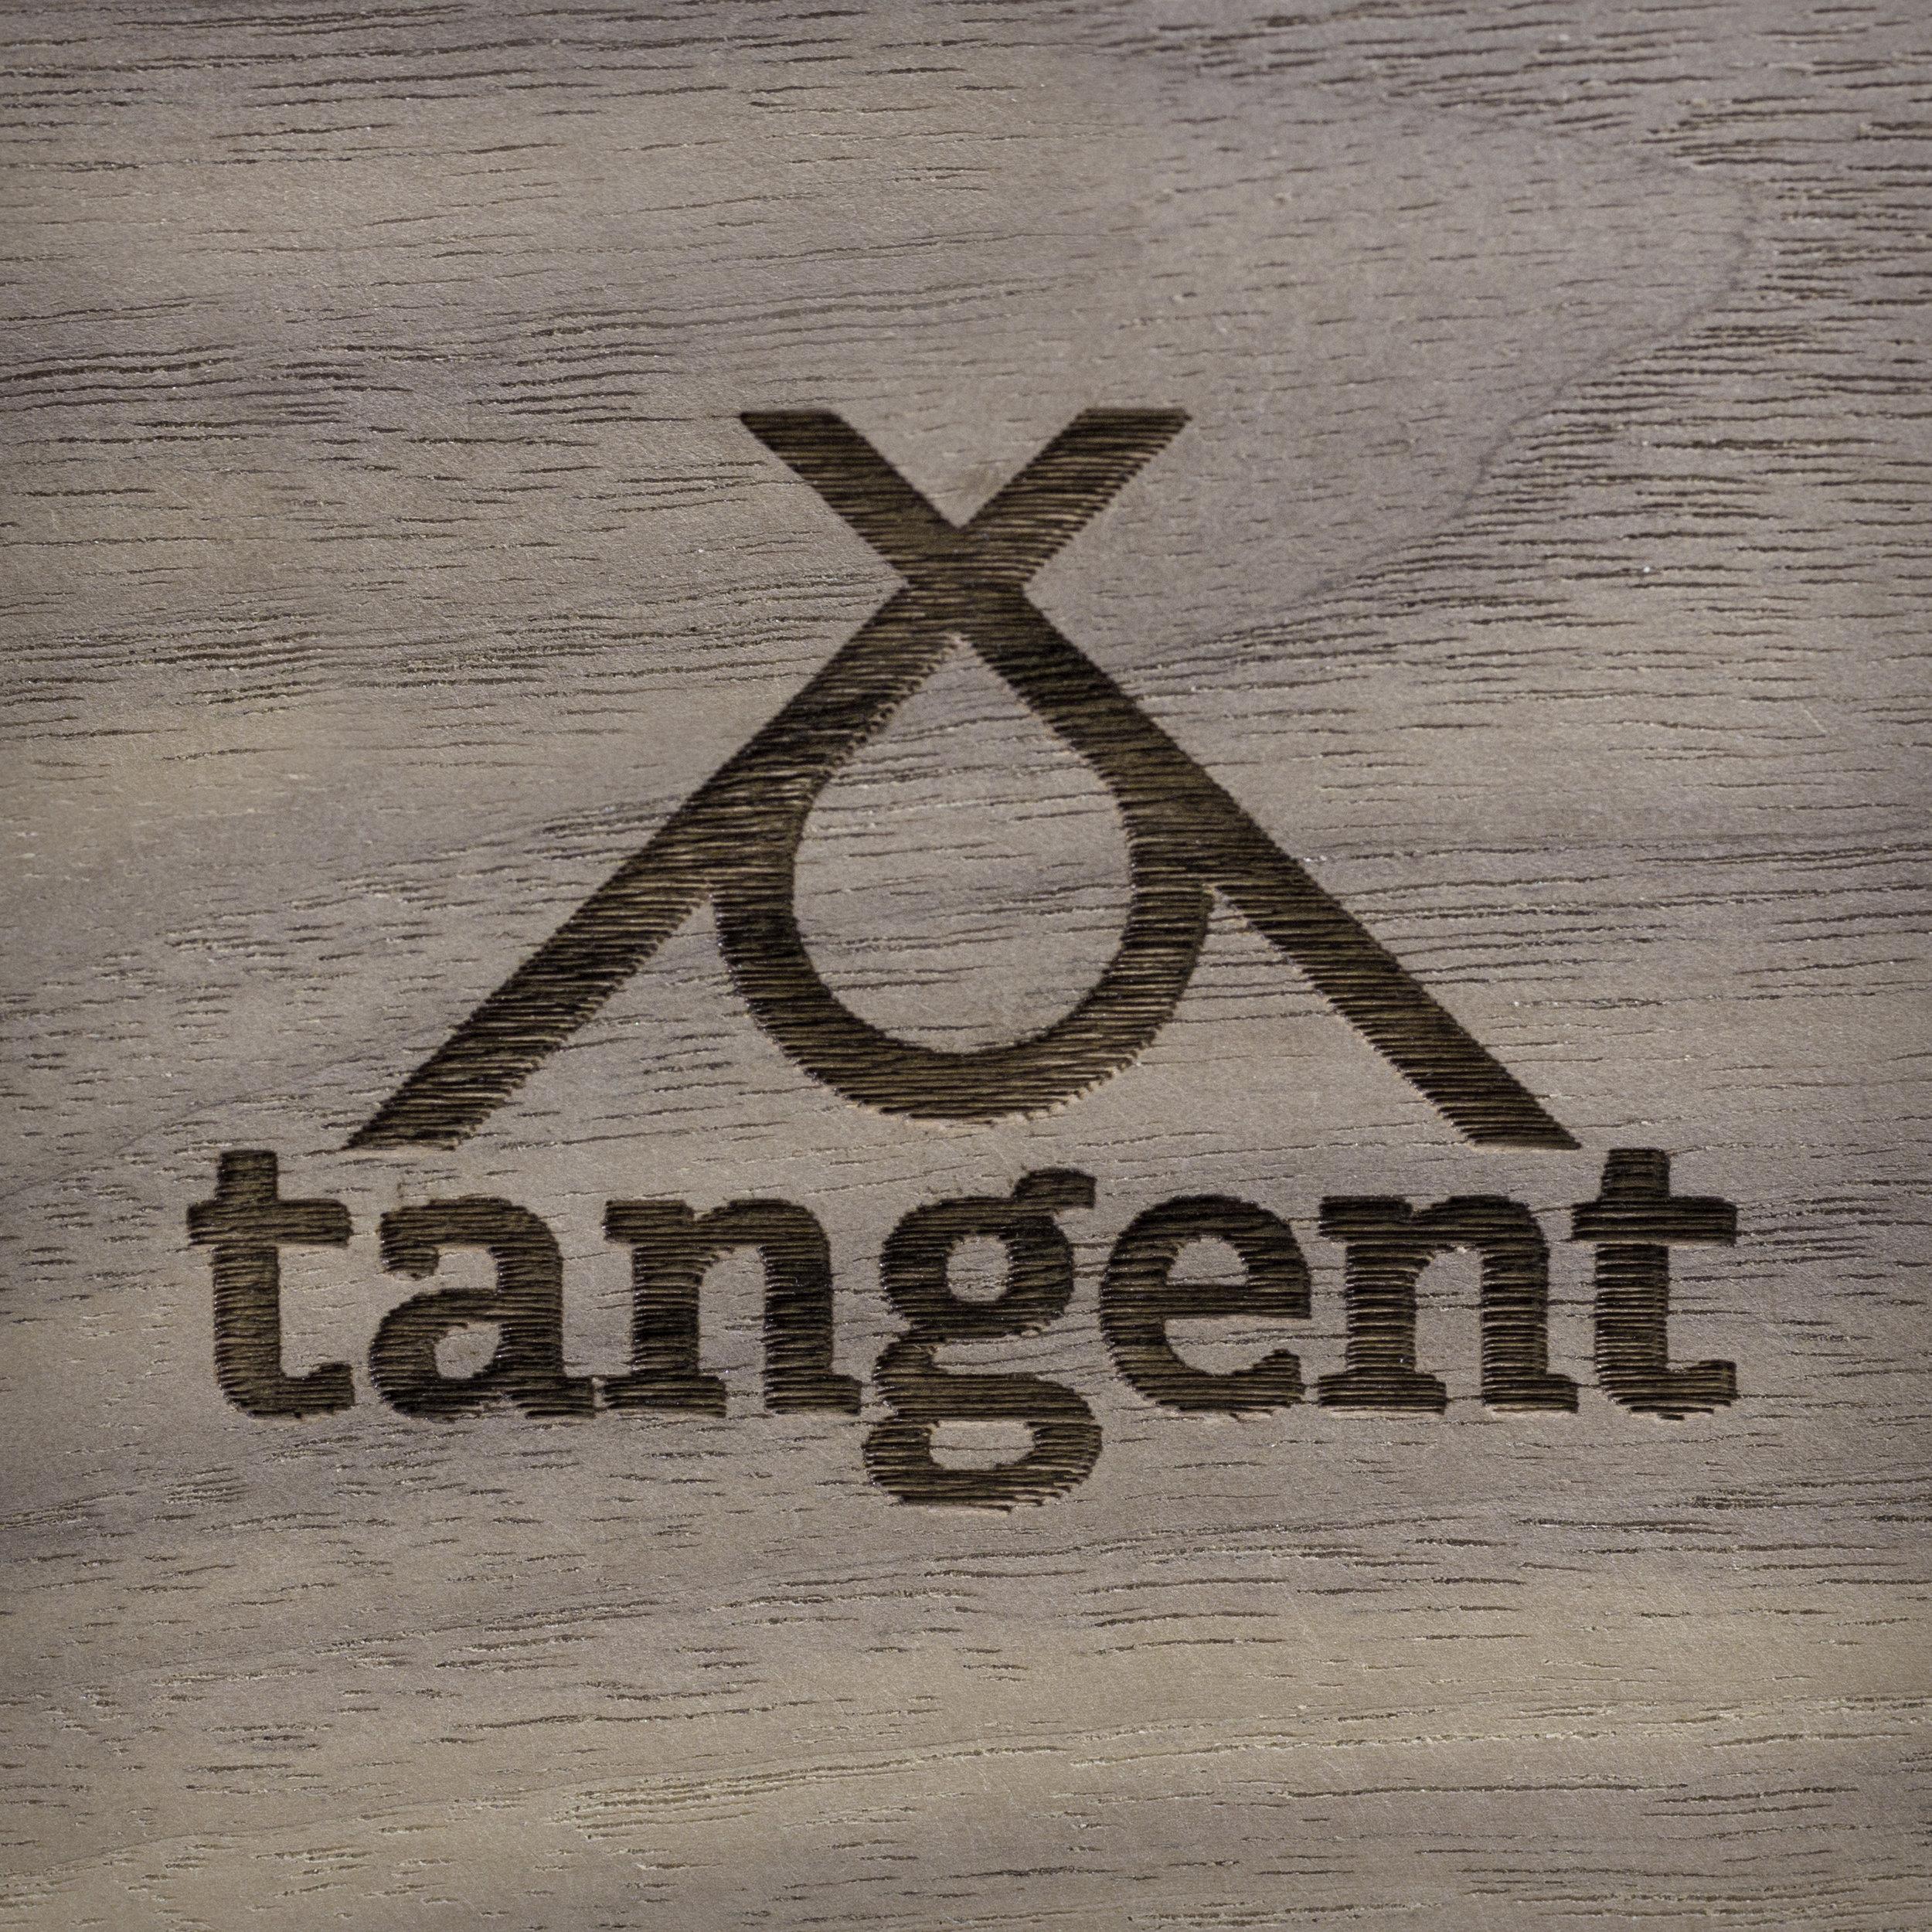 Tagent Logo Etch.jpg